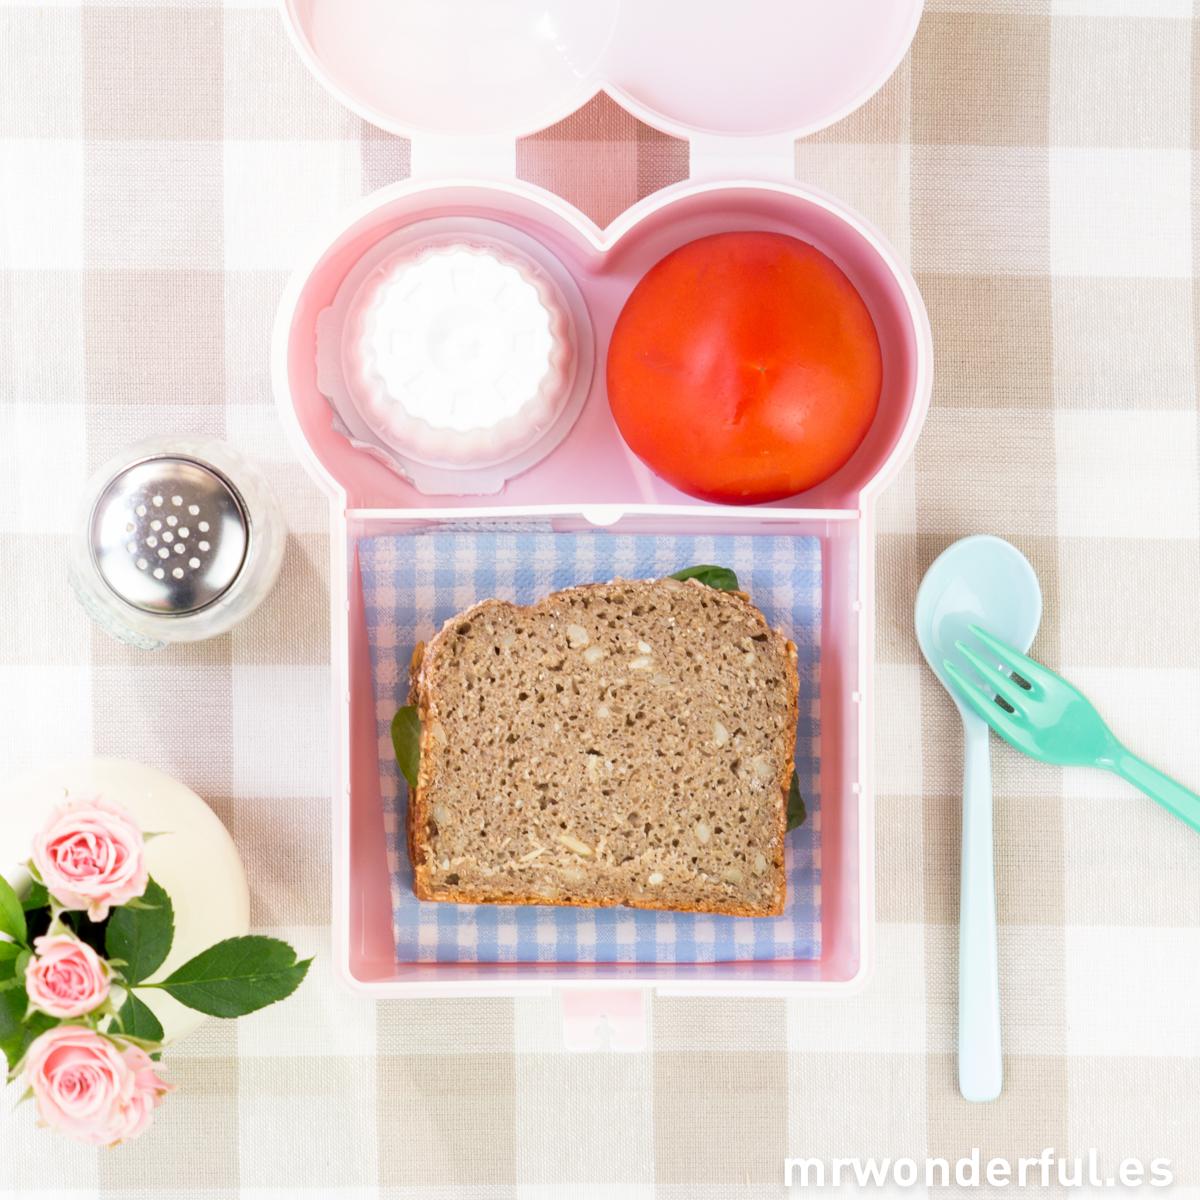 mrwonderful_NL017LP_fiambrera-rosa-sanwich-forma-tostada-5